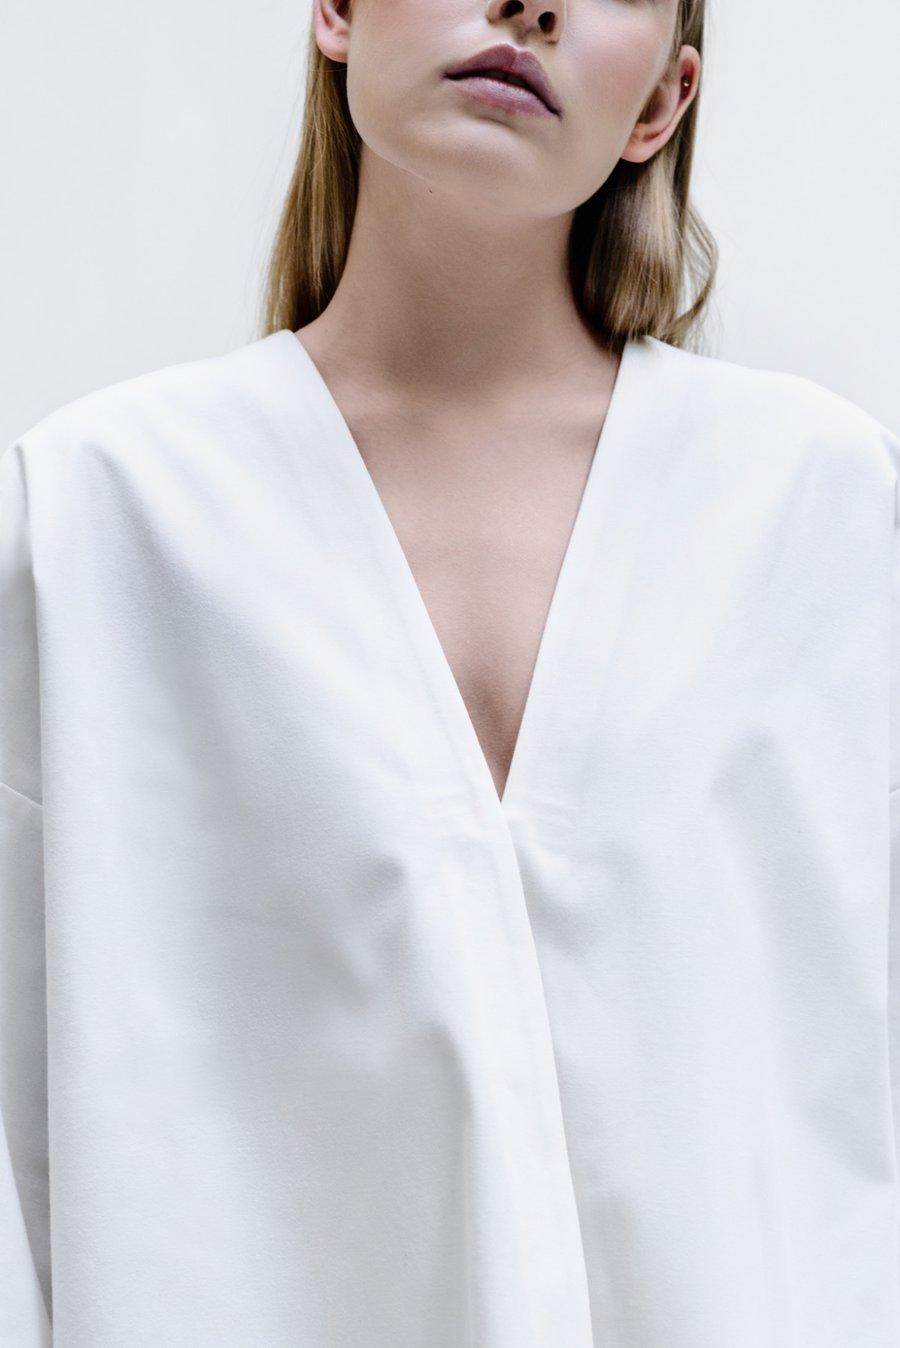 Image of Kimono Shirt